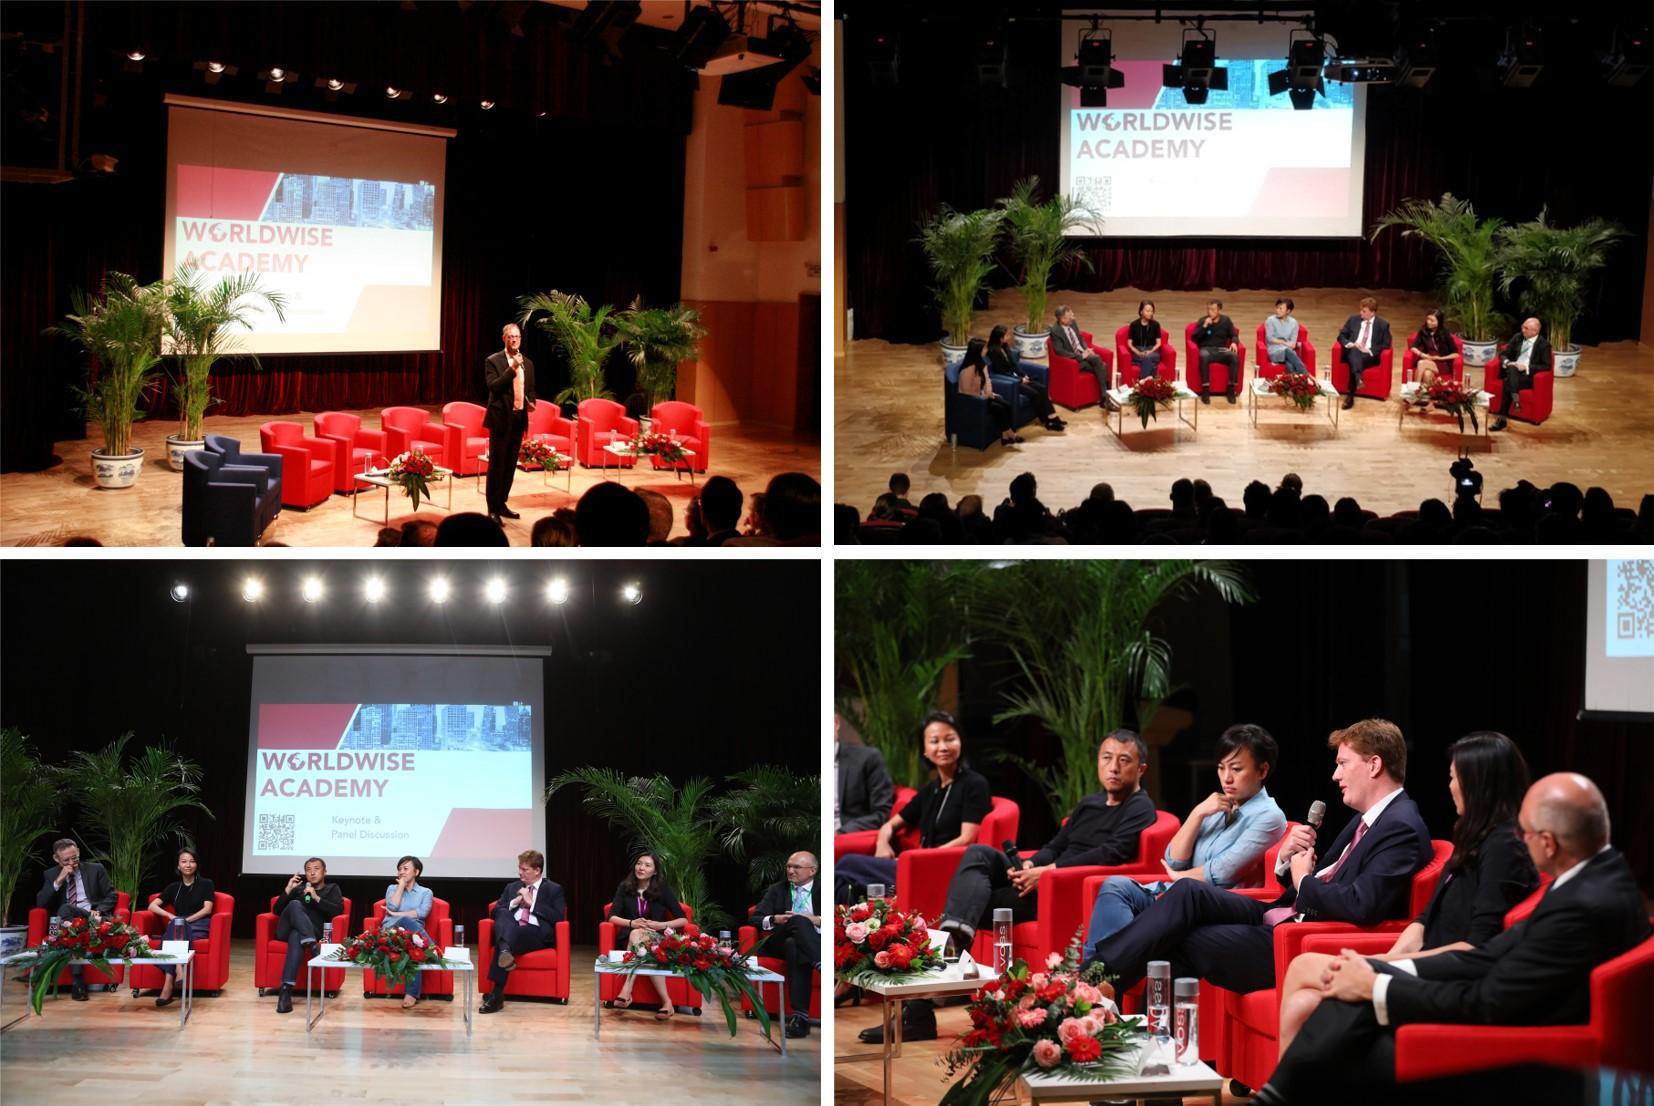 dcb-worldwise-academy-launch-keynote-and-panel